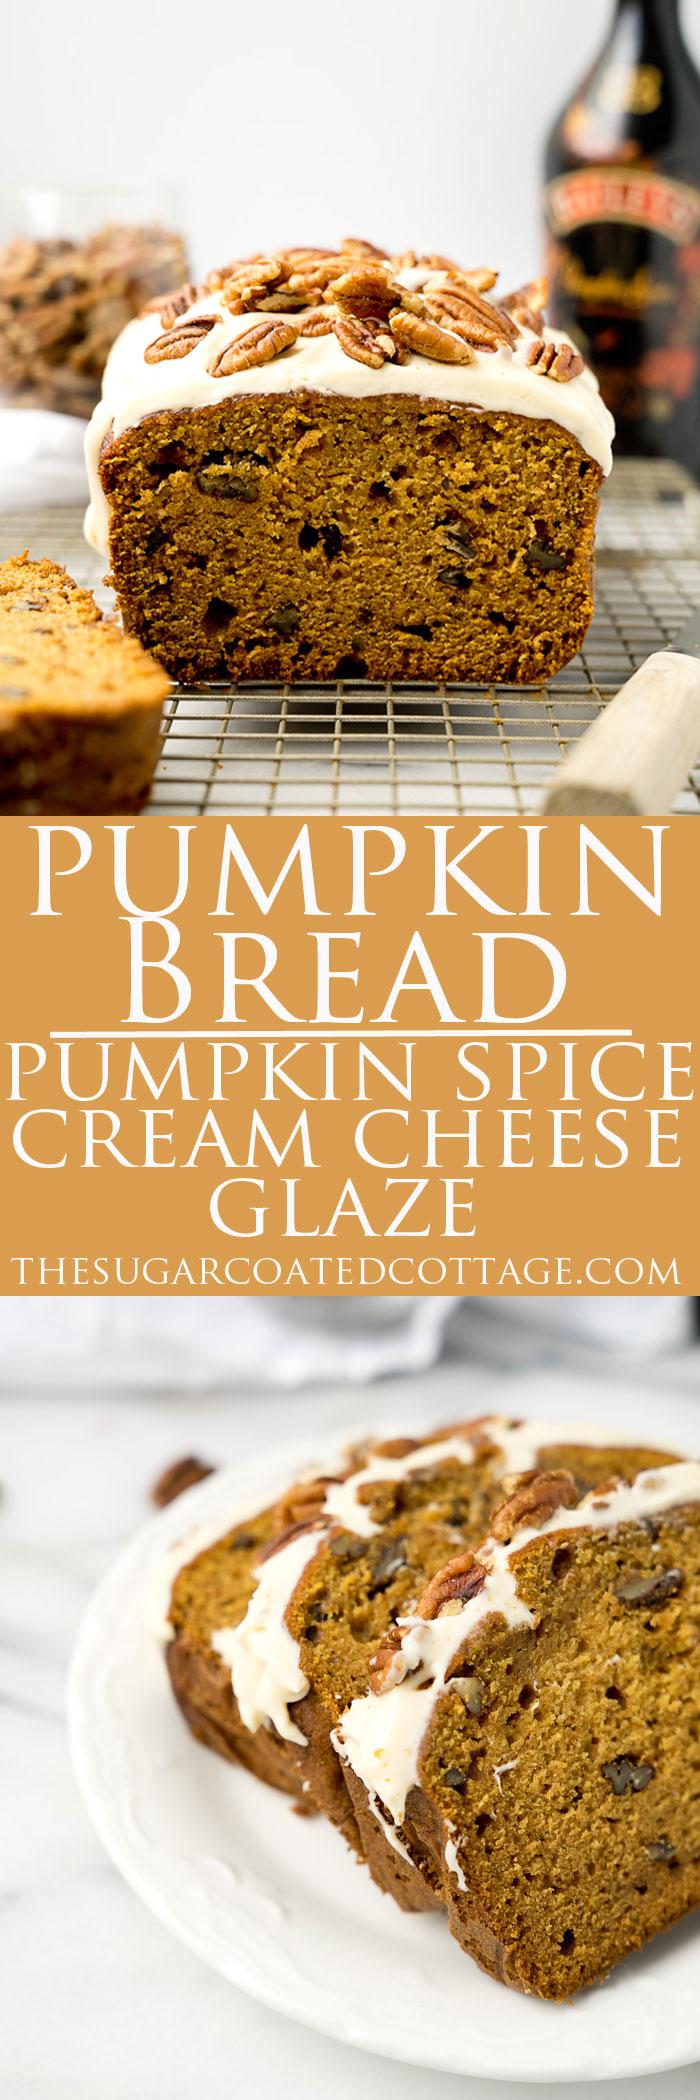 Pecan Pumpkin Bread with Pumpkin Spice Cream Cheese Glaze. The best pumpkin bread recipe and glaze you'll ever eat. | thesugarcoatedcottage.com